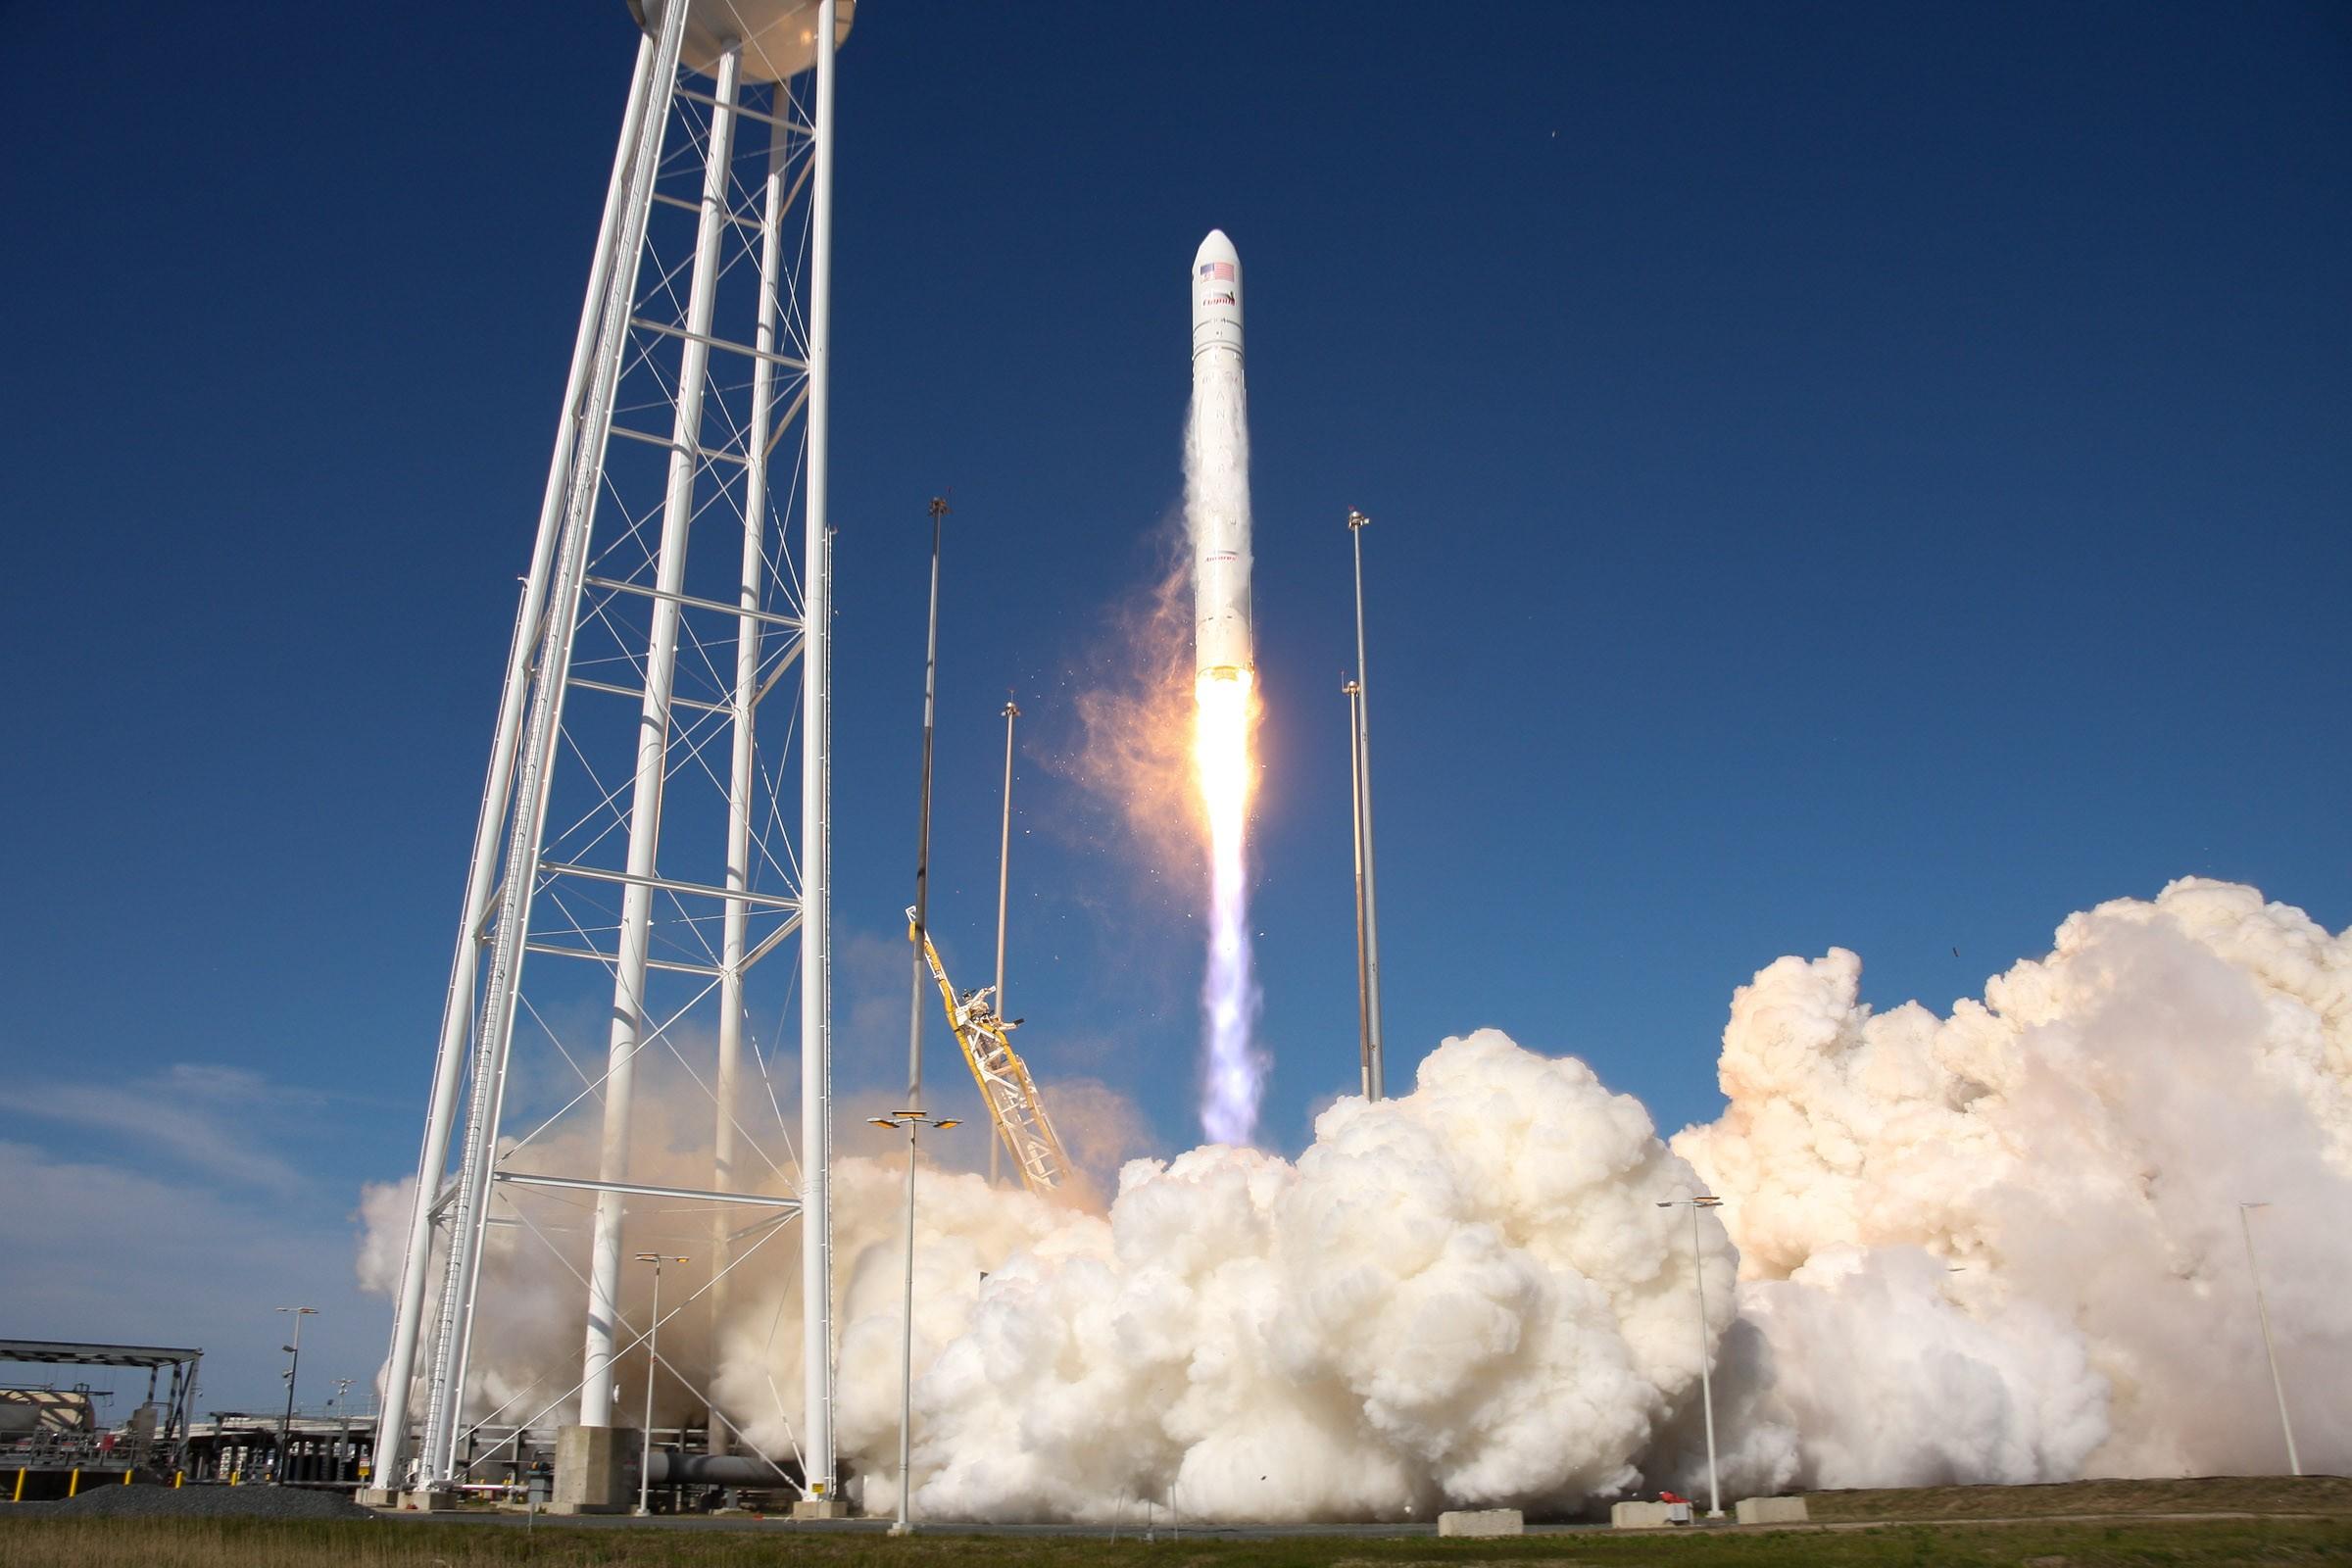 lançamento do foguete antares (Foto: centro goddard da nasa)